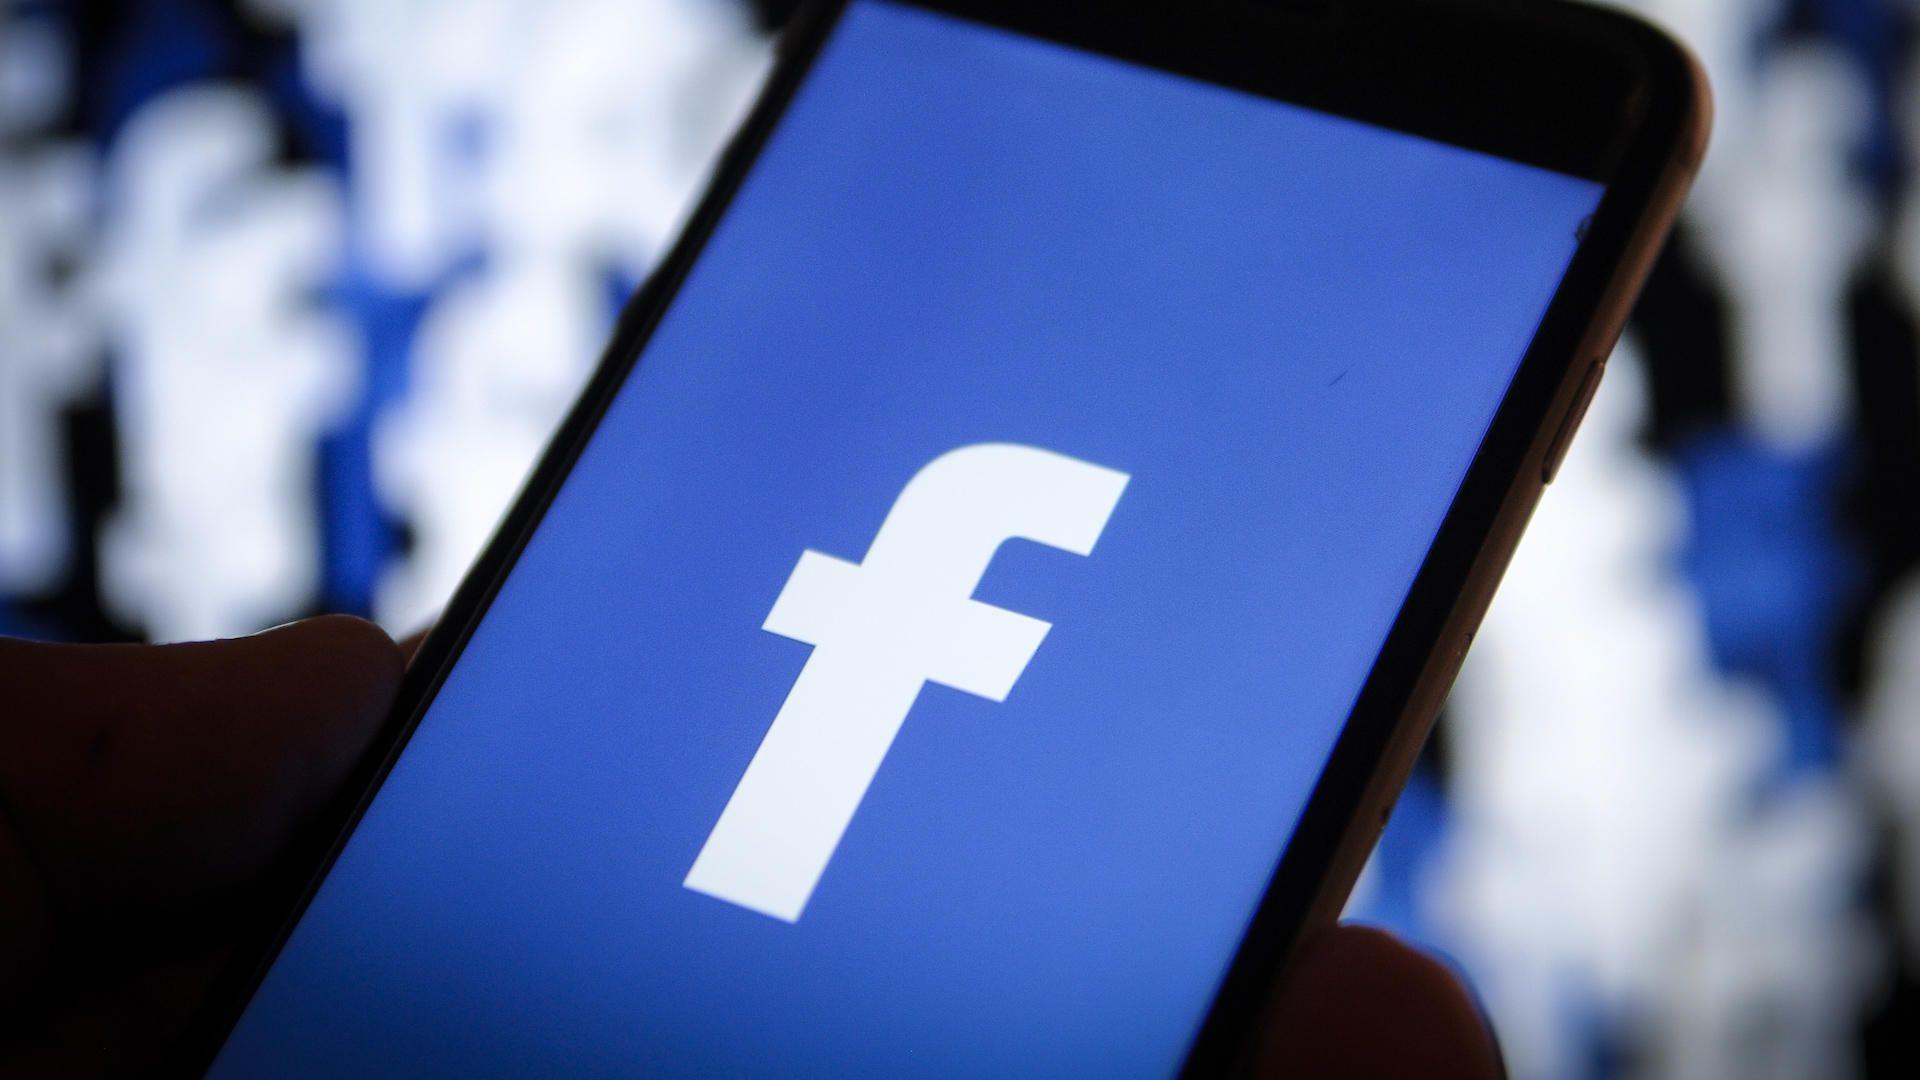 Facebook propone enviarle fotos íntimas para prevenir difusión no consentida